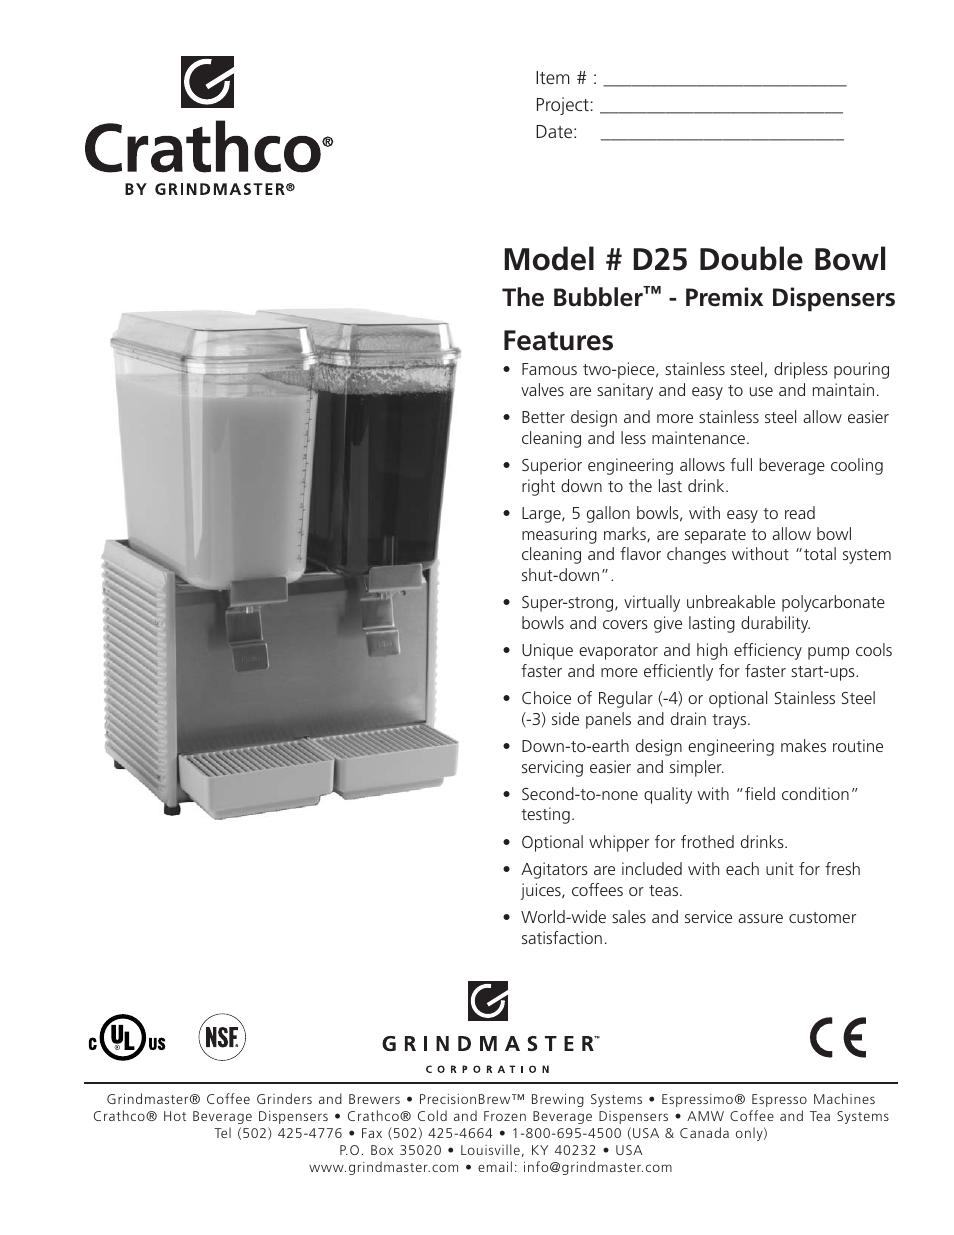 Grindmaster The BubblerTM - Premix Dispensers D25 Double Bowl User Manual |  2 pages